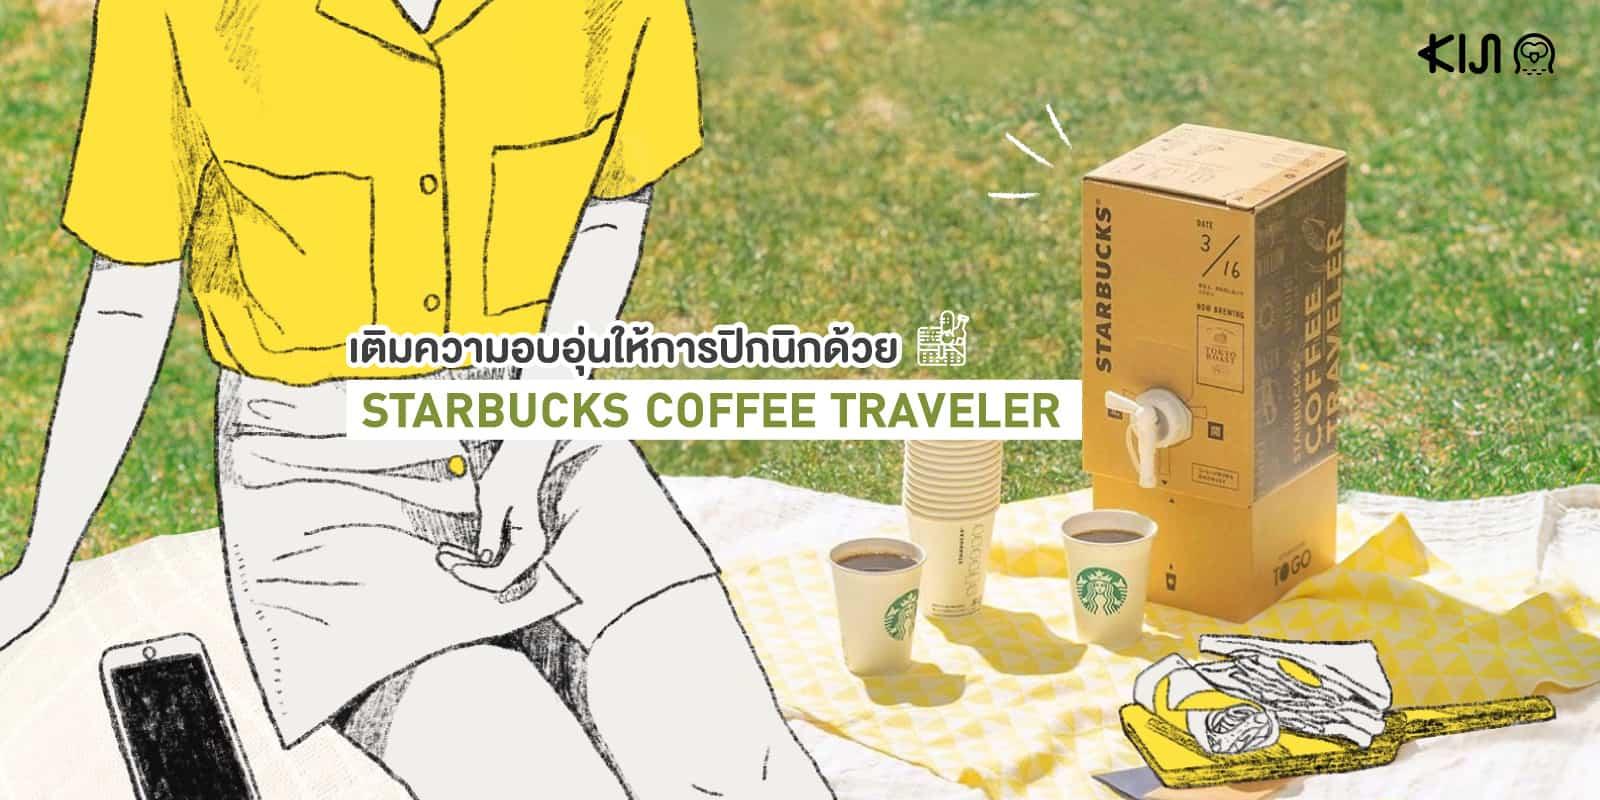 STARBUCKS COFFEE TRAVELER